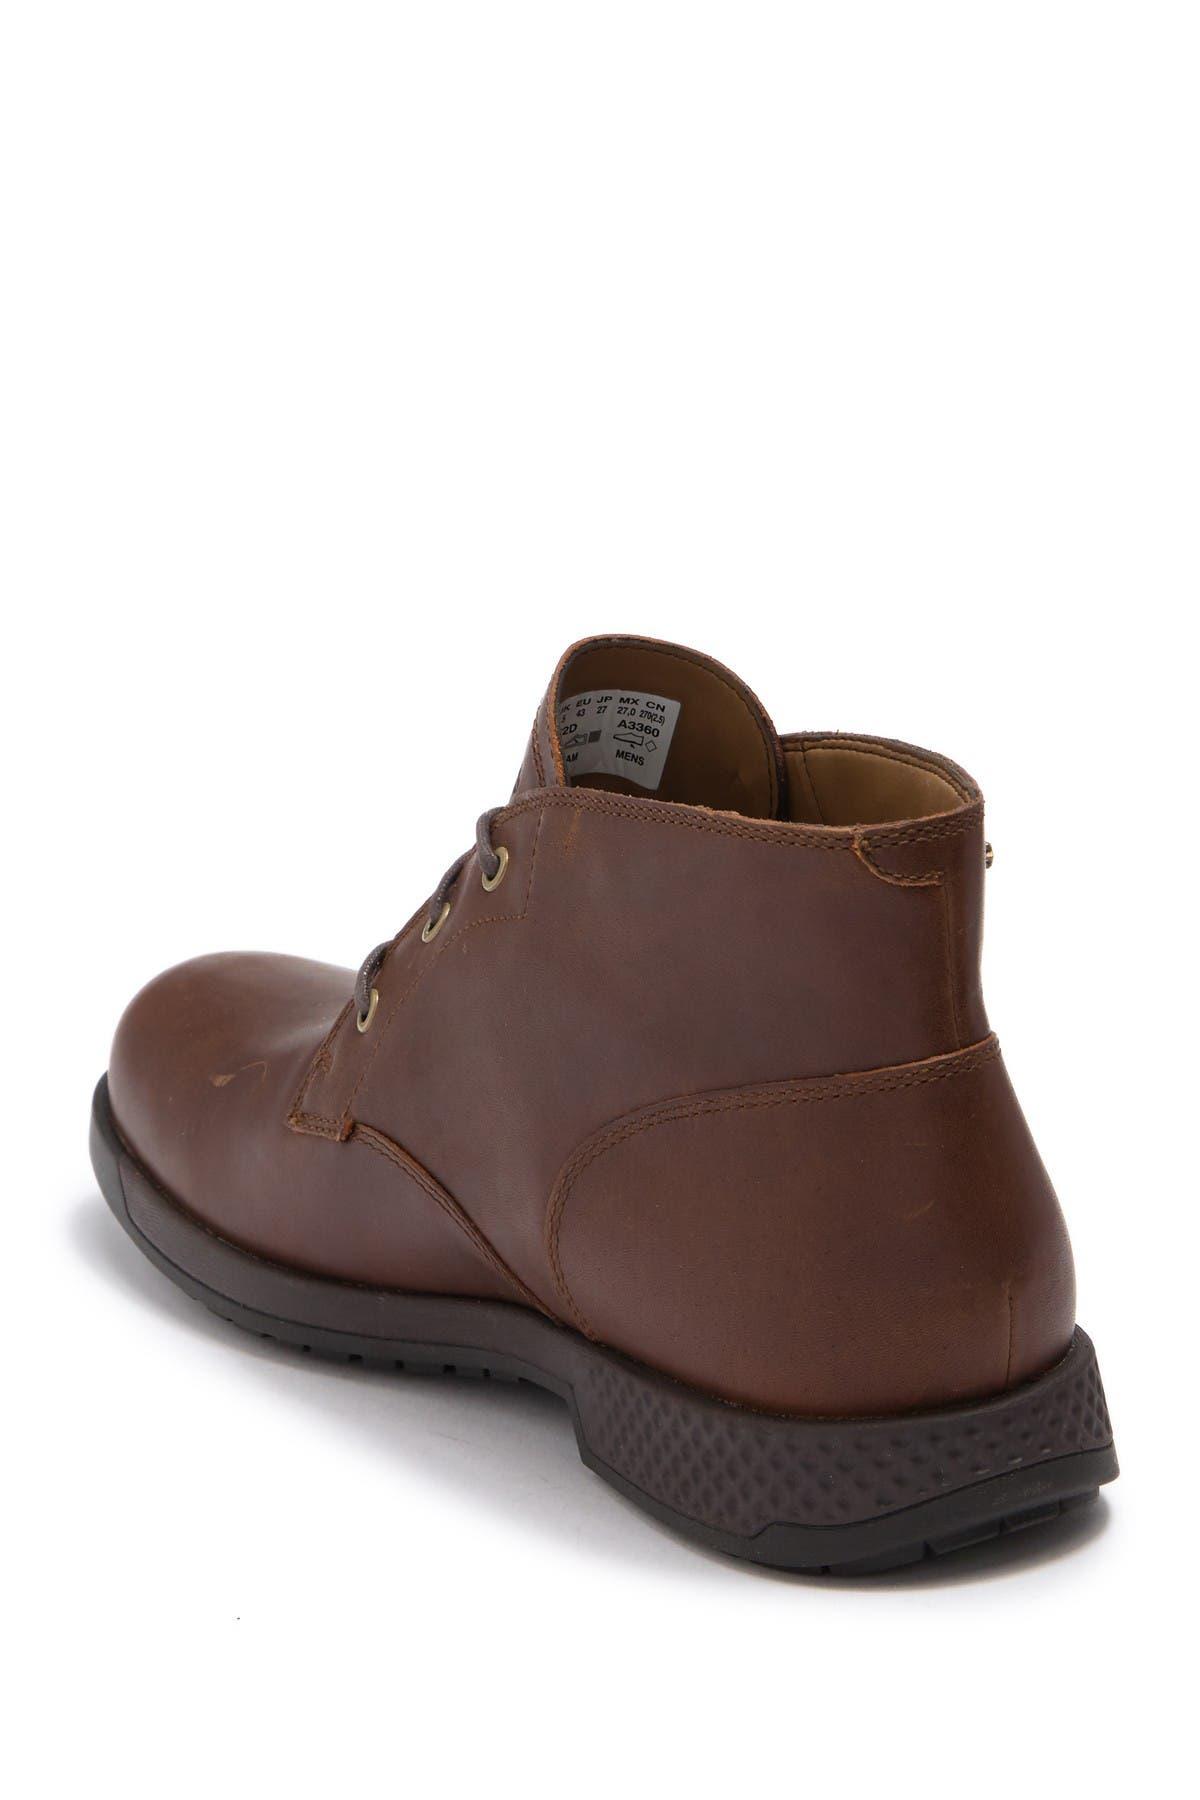 City's Edge Waterproof Leather Chukka